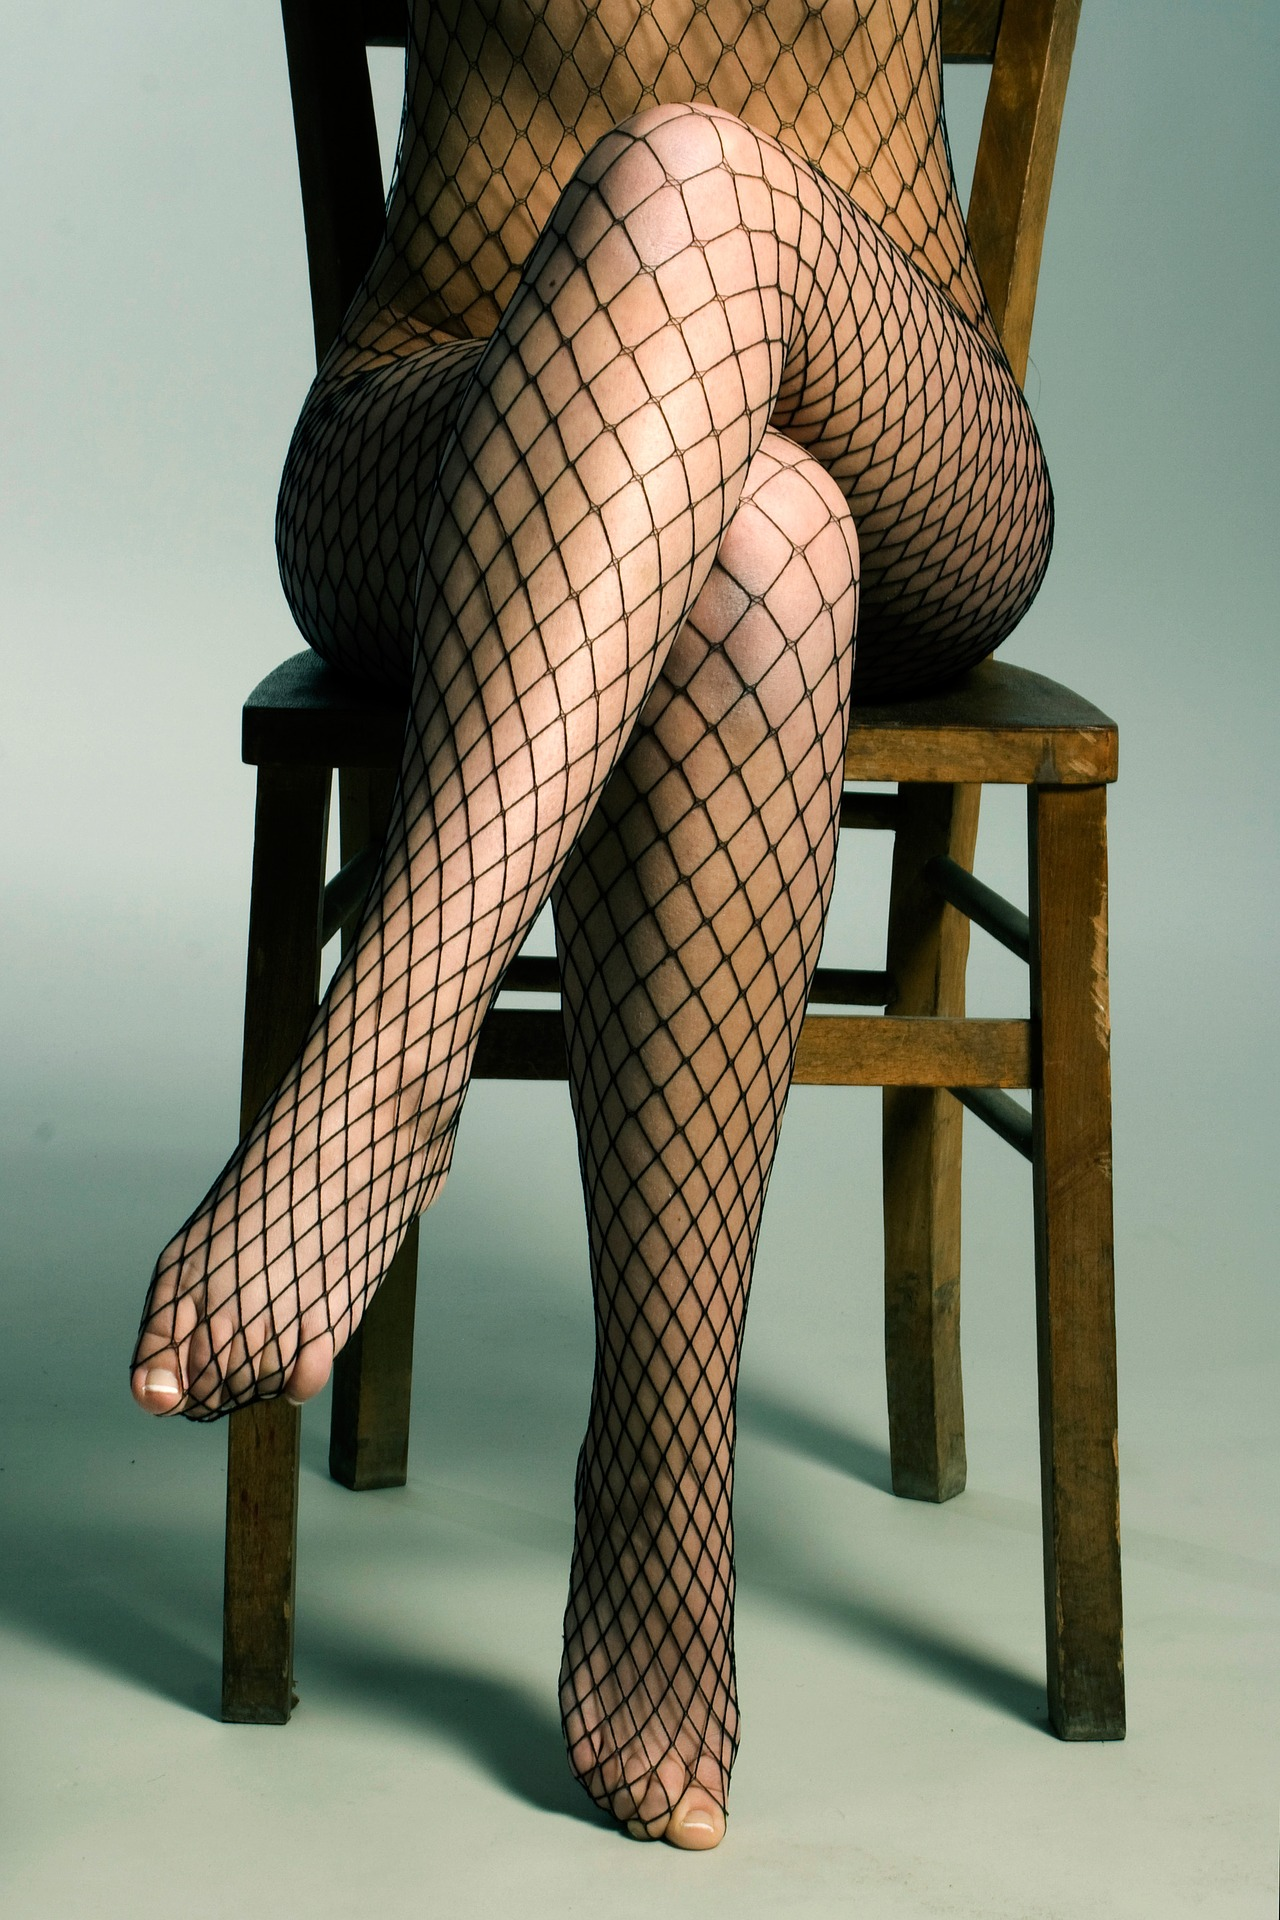 Frau im Netz-Catsuit